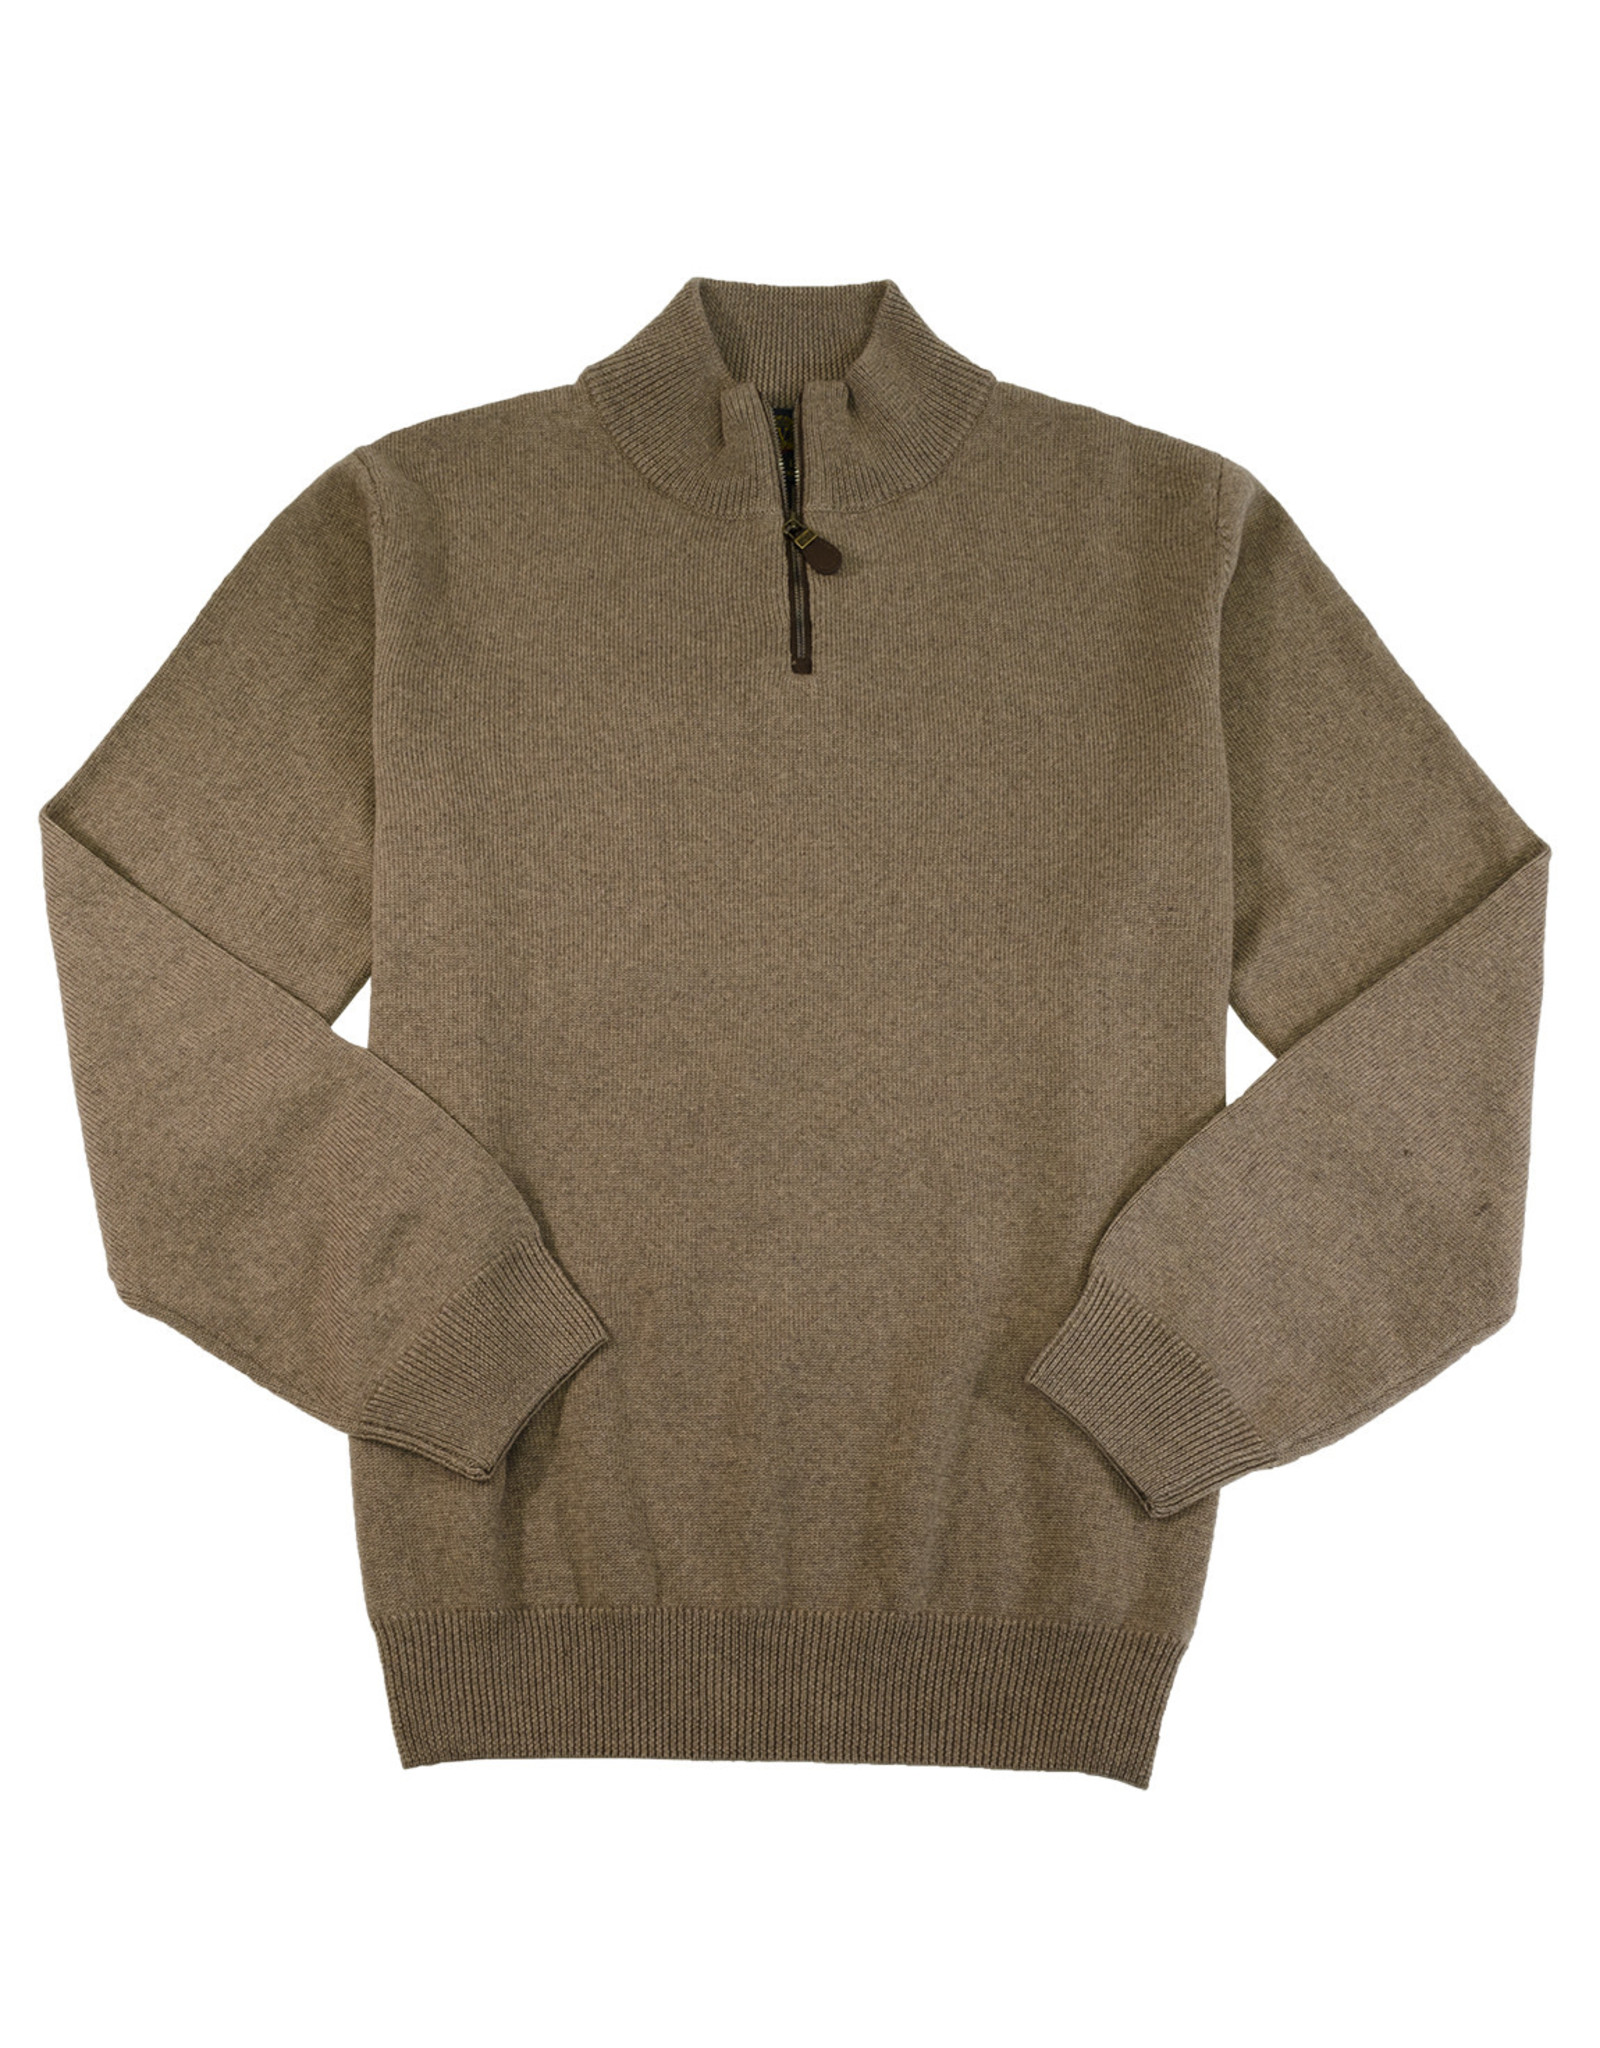 Viyella 1/4 Zip Mock Neck Sweater